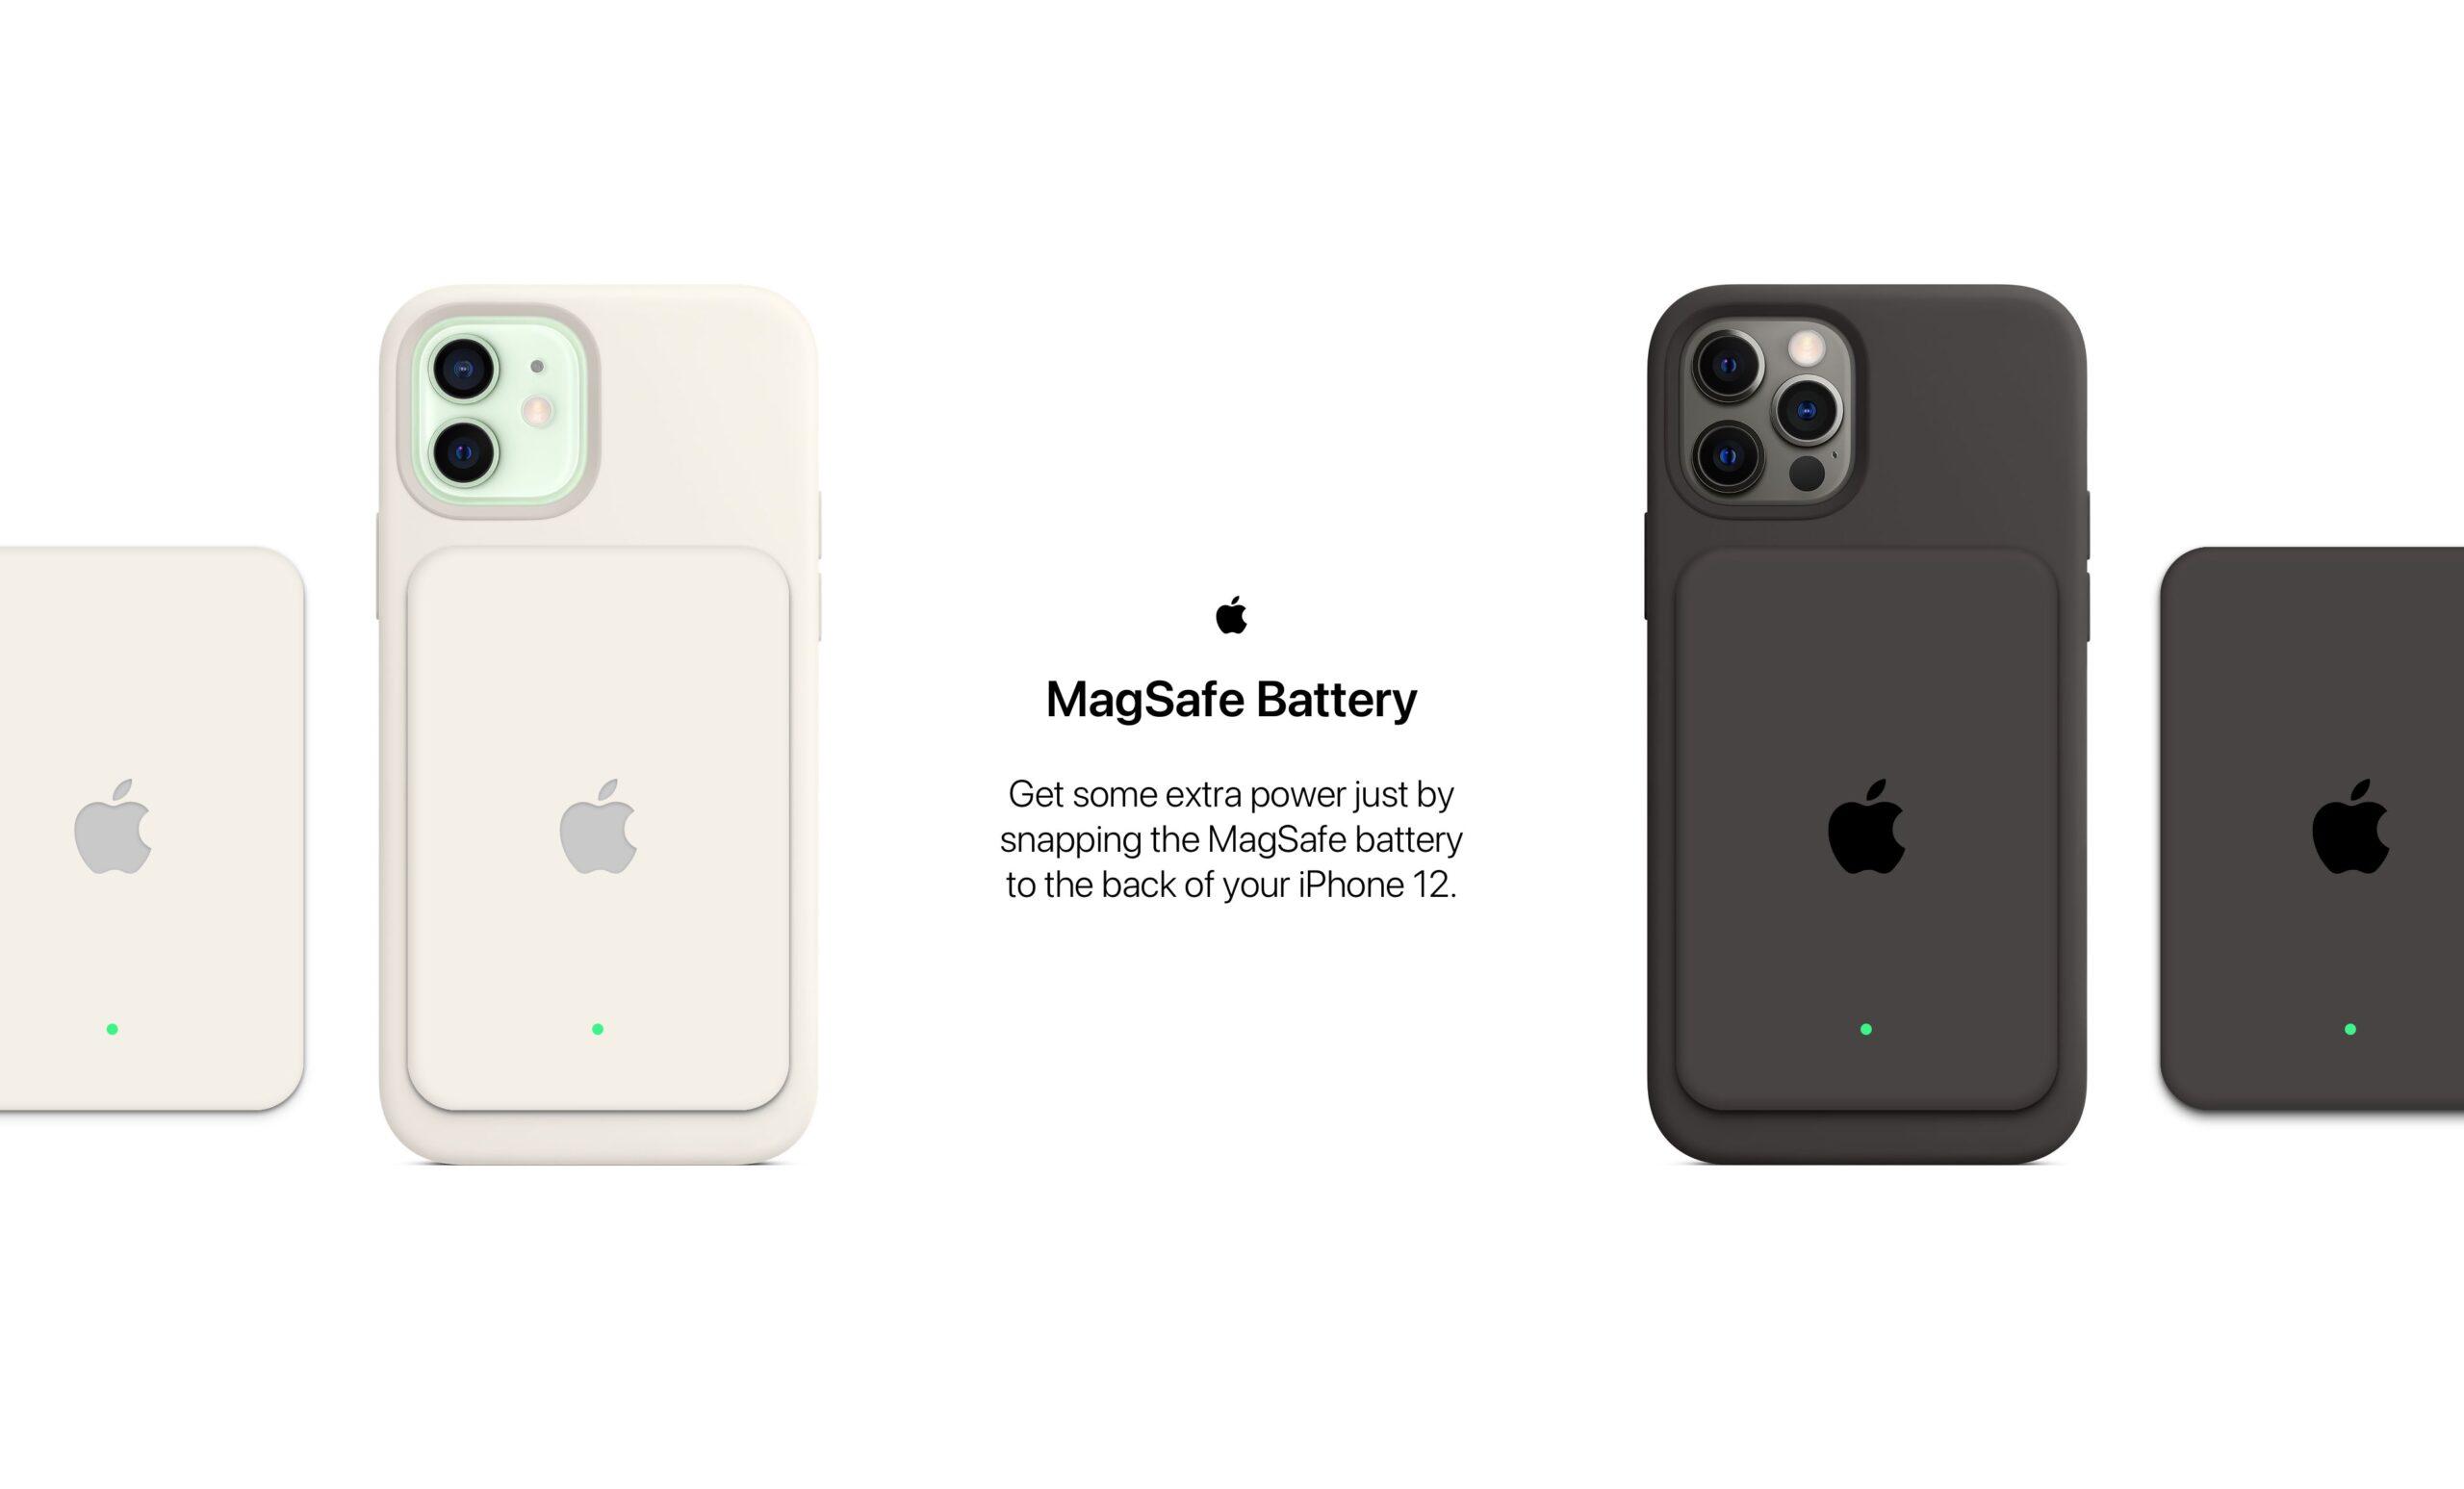 Conceito de MagSafe Battery por Parker Ortolani